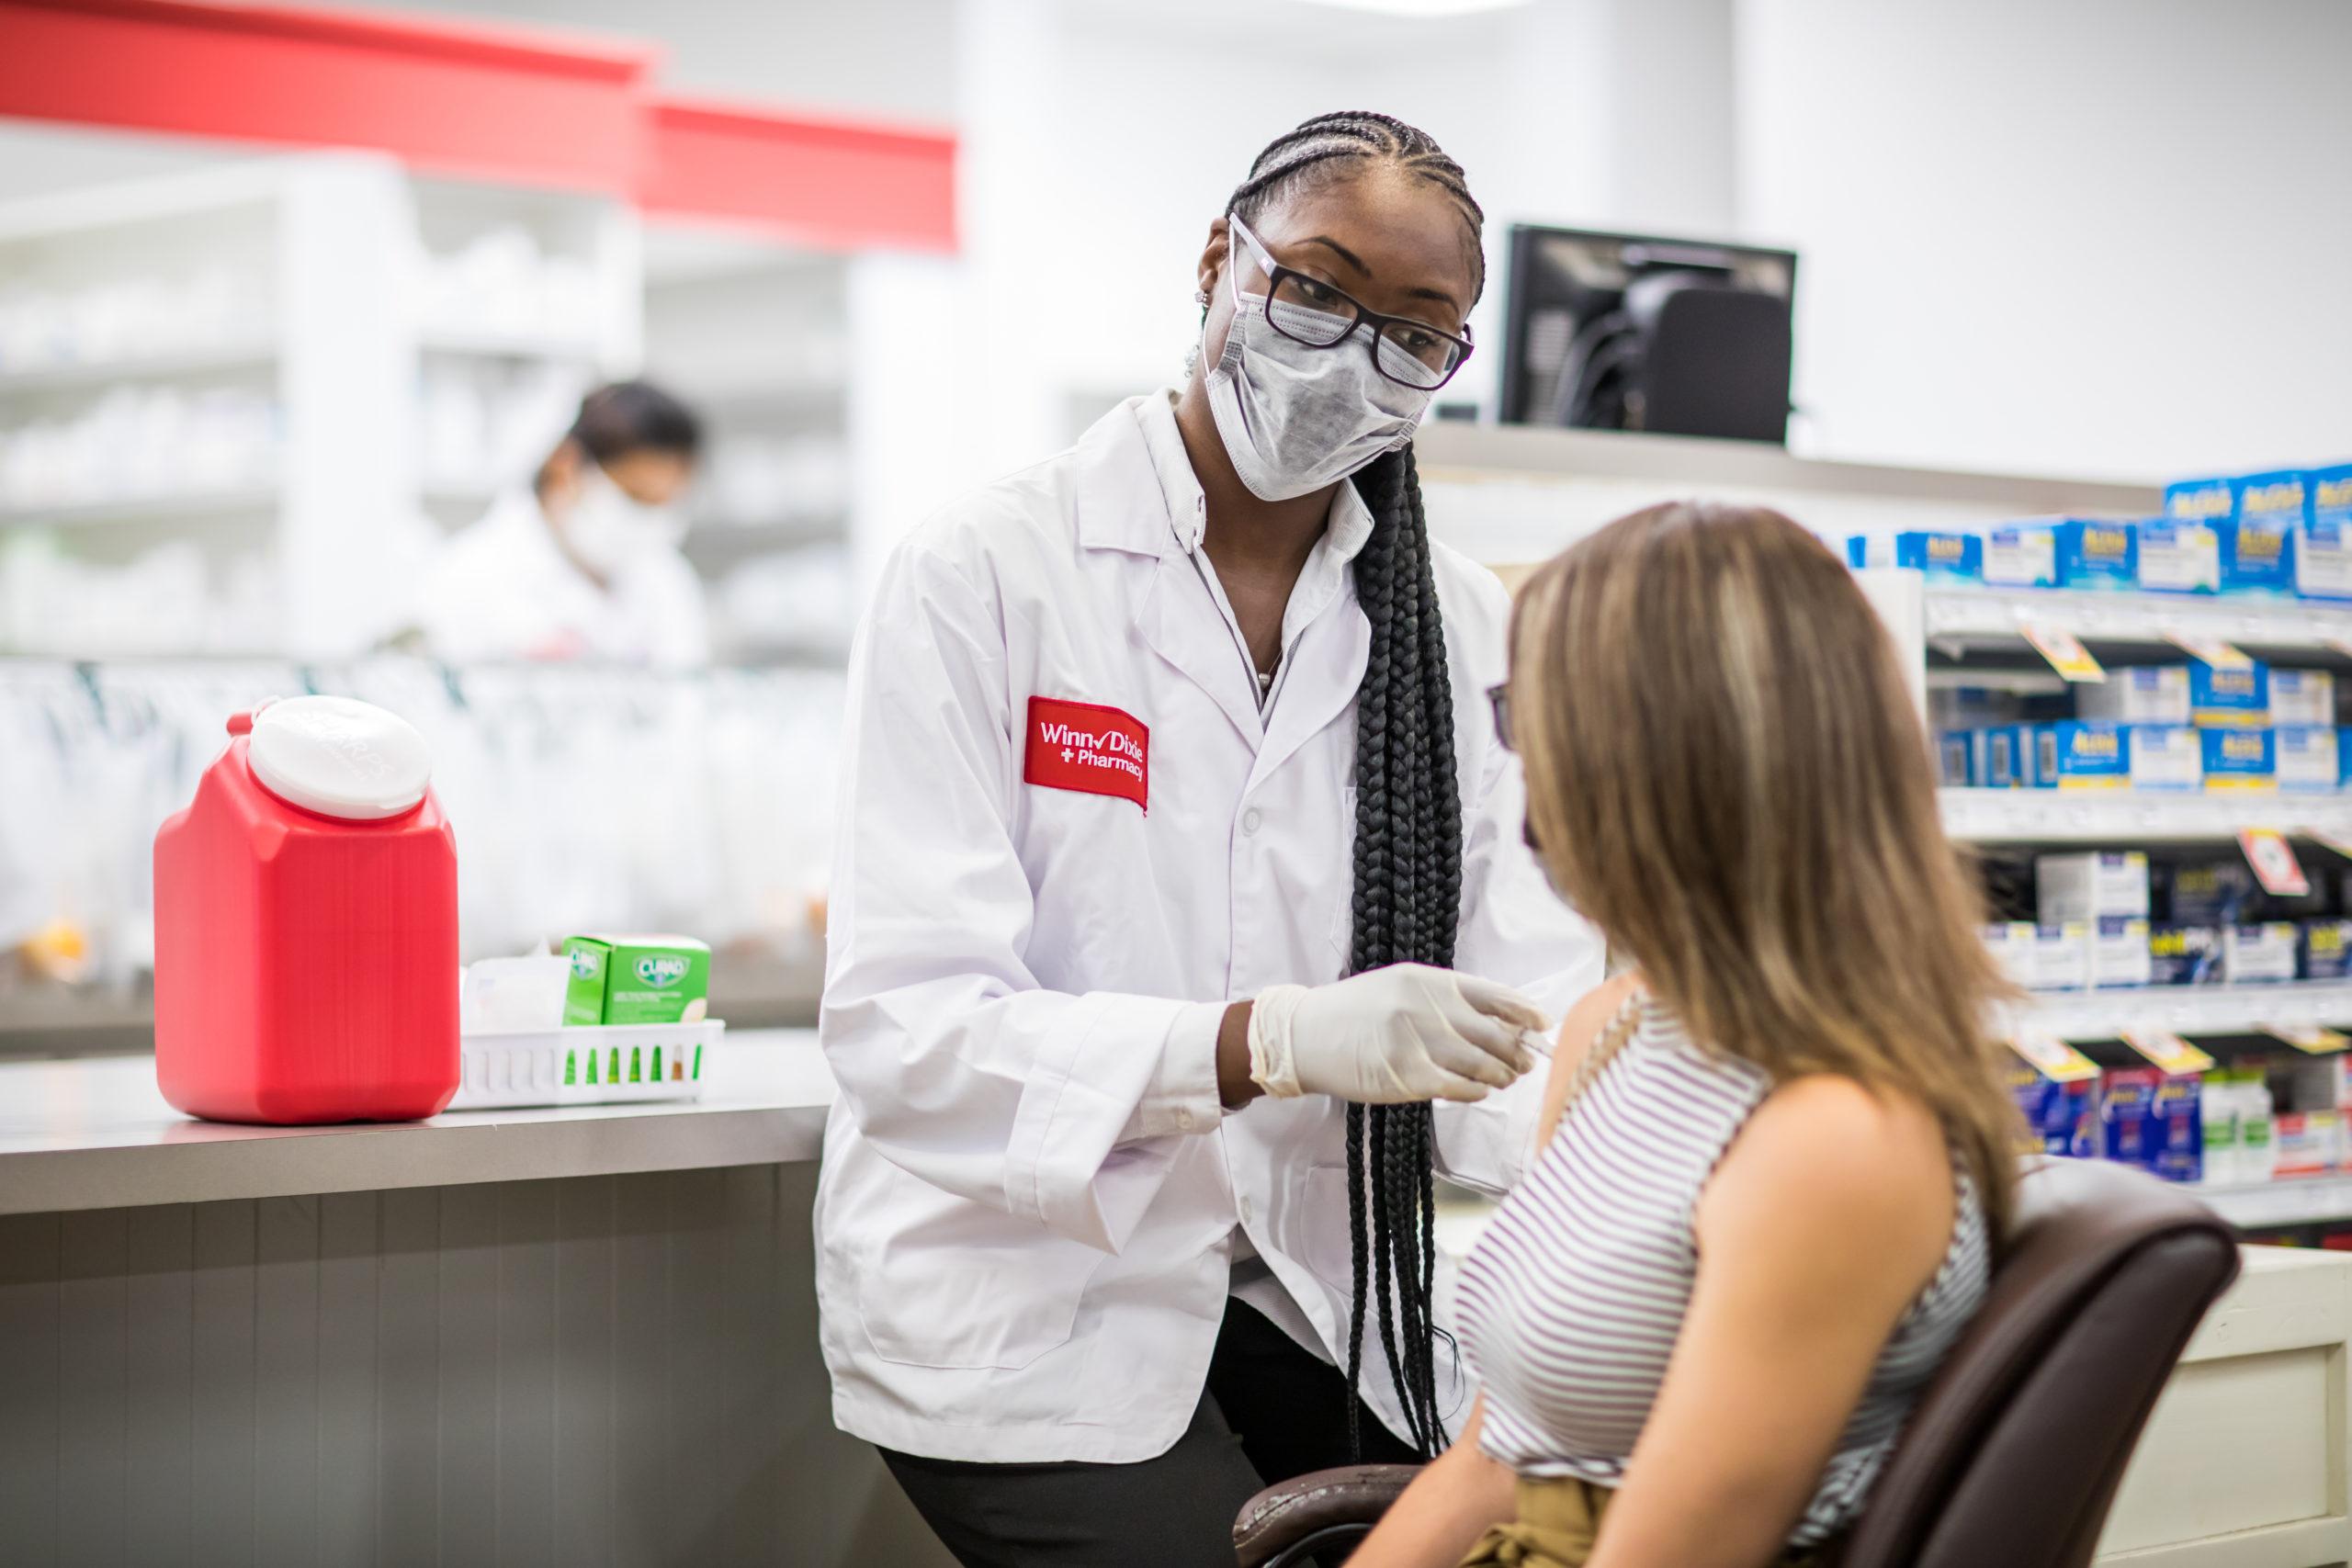 Winn-Dixie to begin COVID-19 vaccinations on Feb. 11 - Wink News